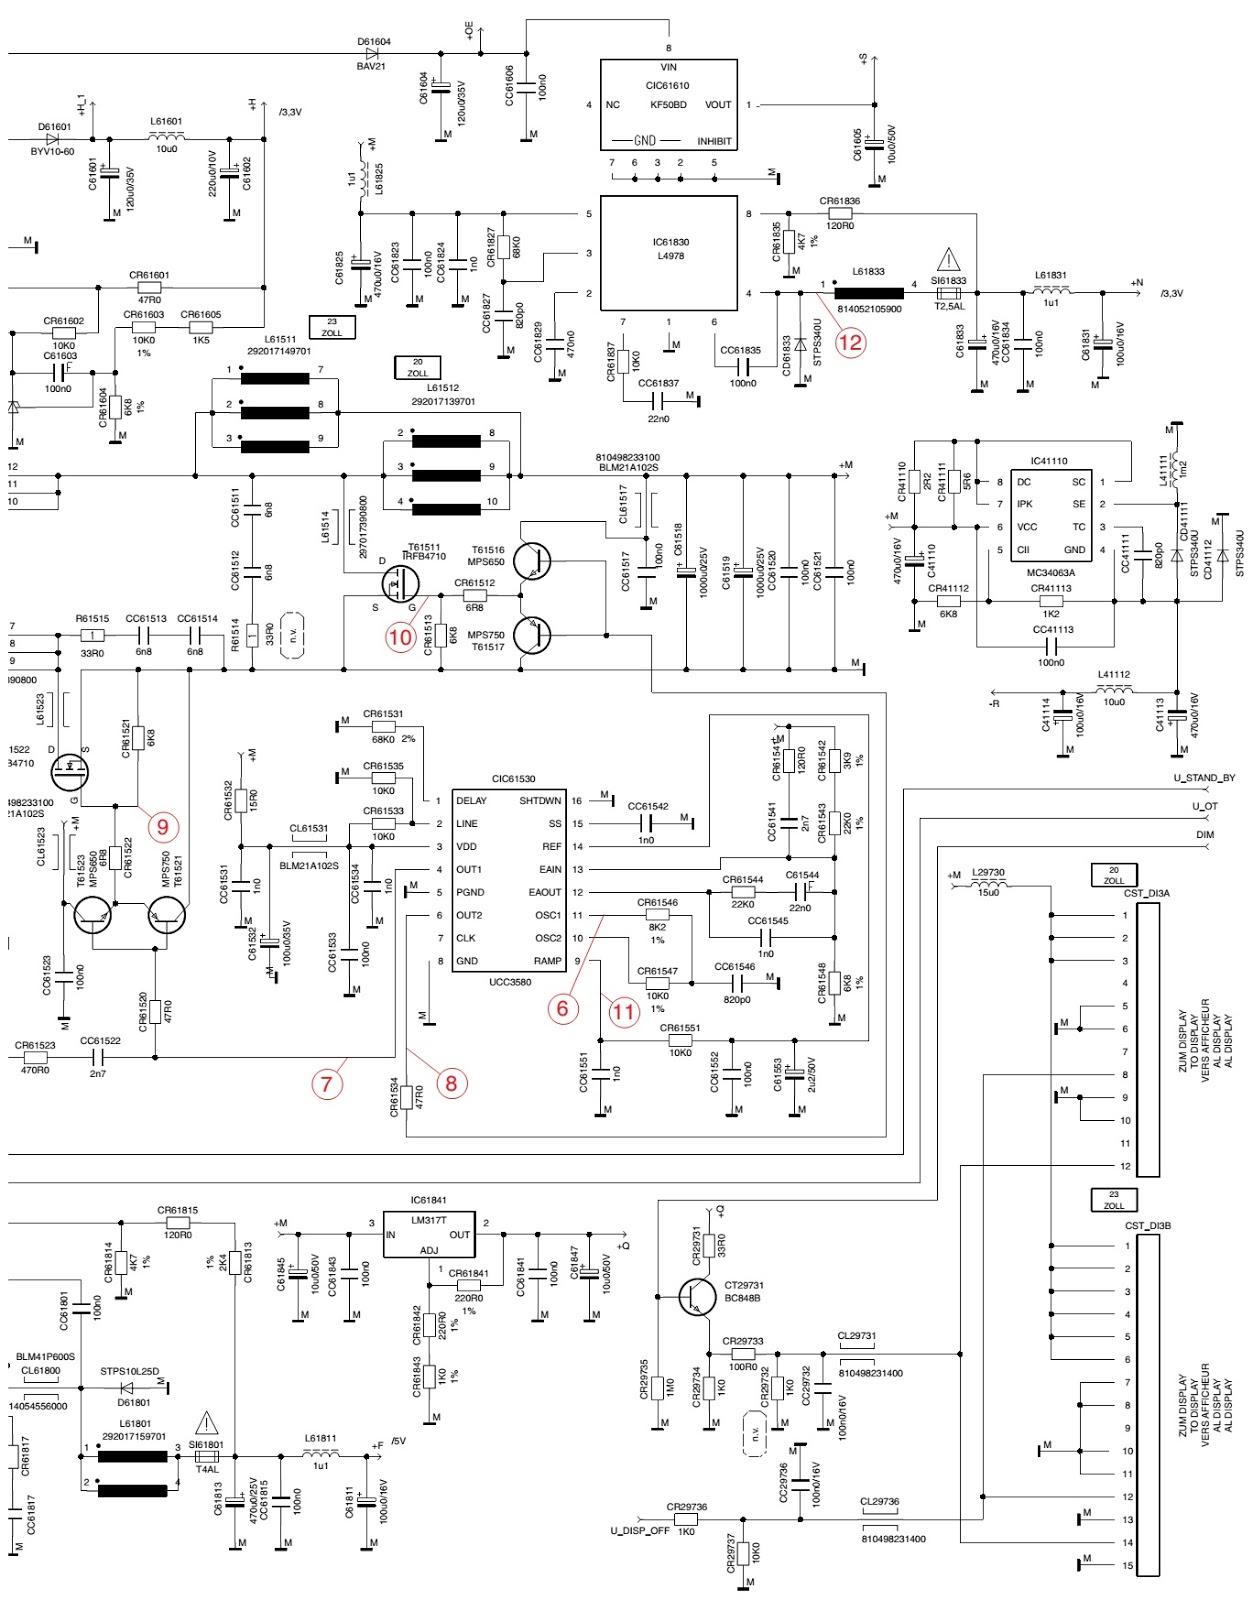 Fantastic Smps Pinout Crest - The Best Electrical Circuit Diagram ...